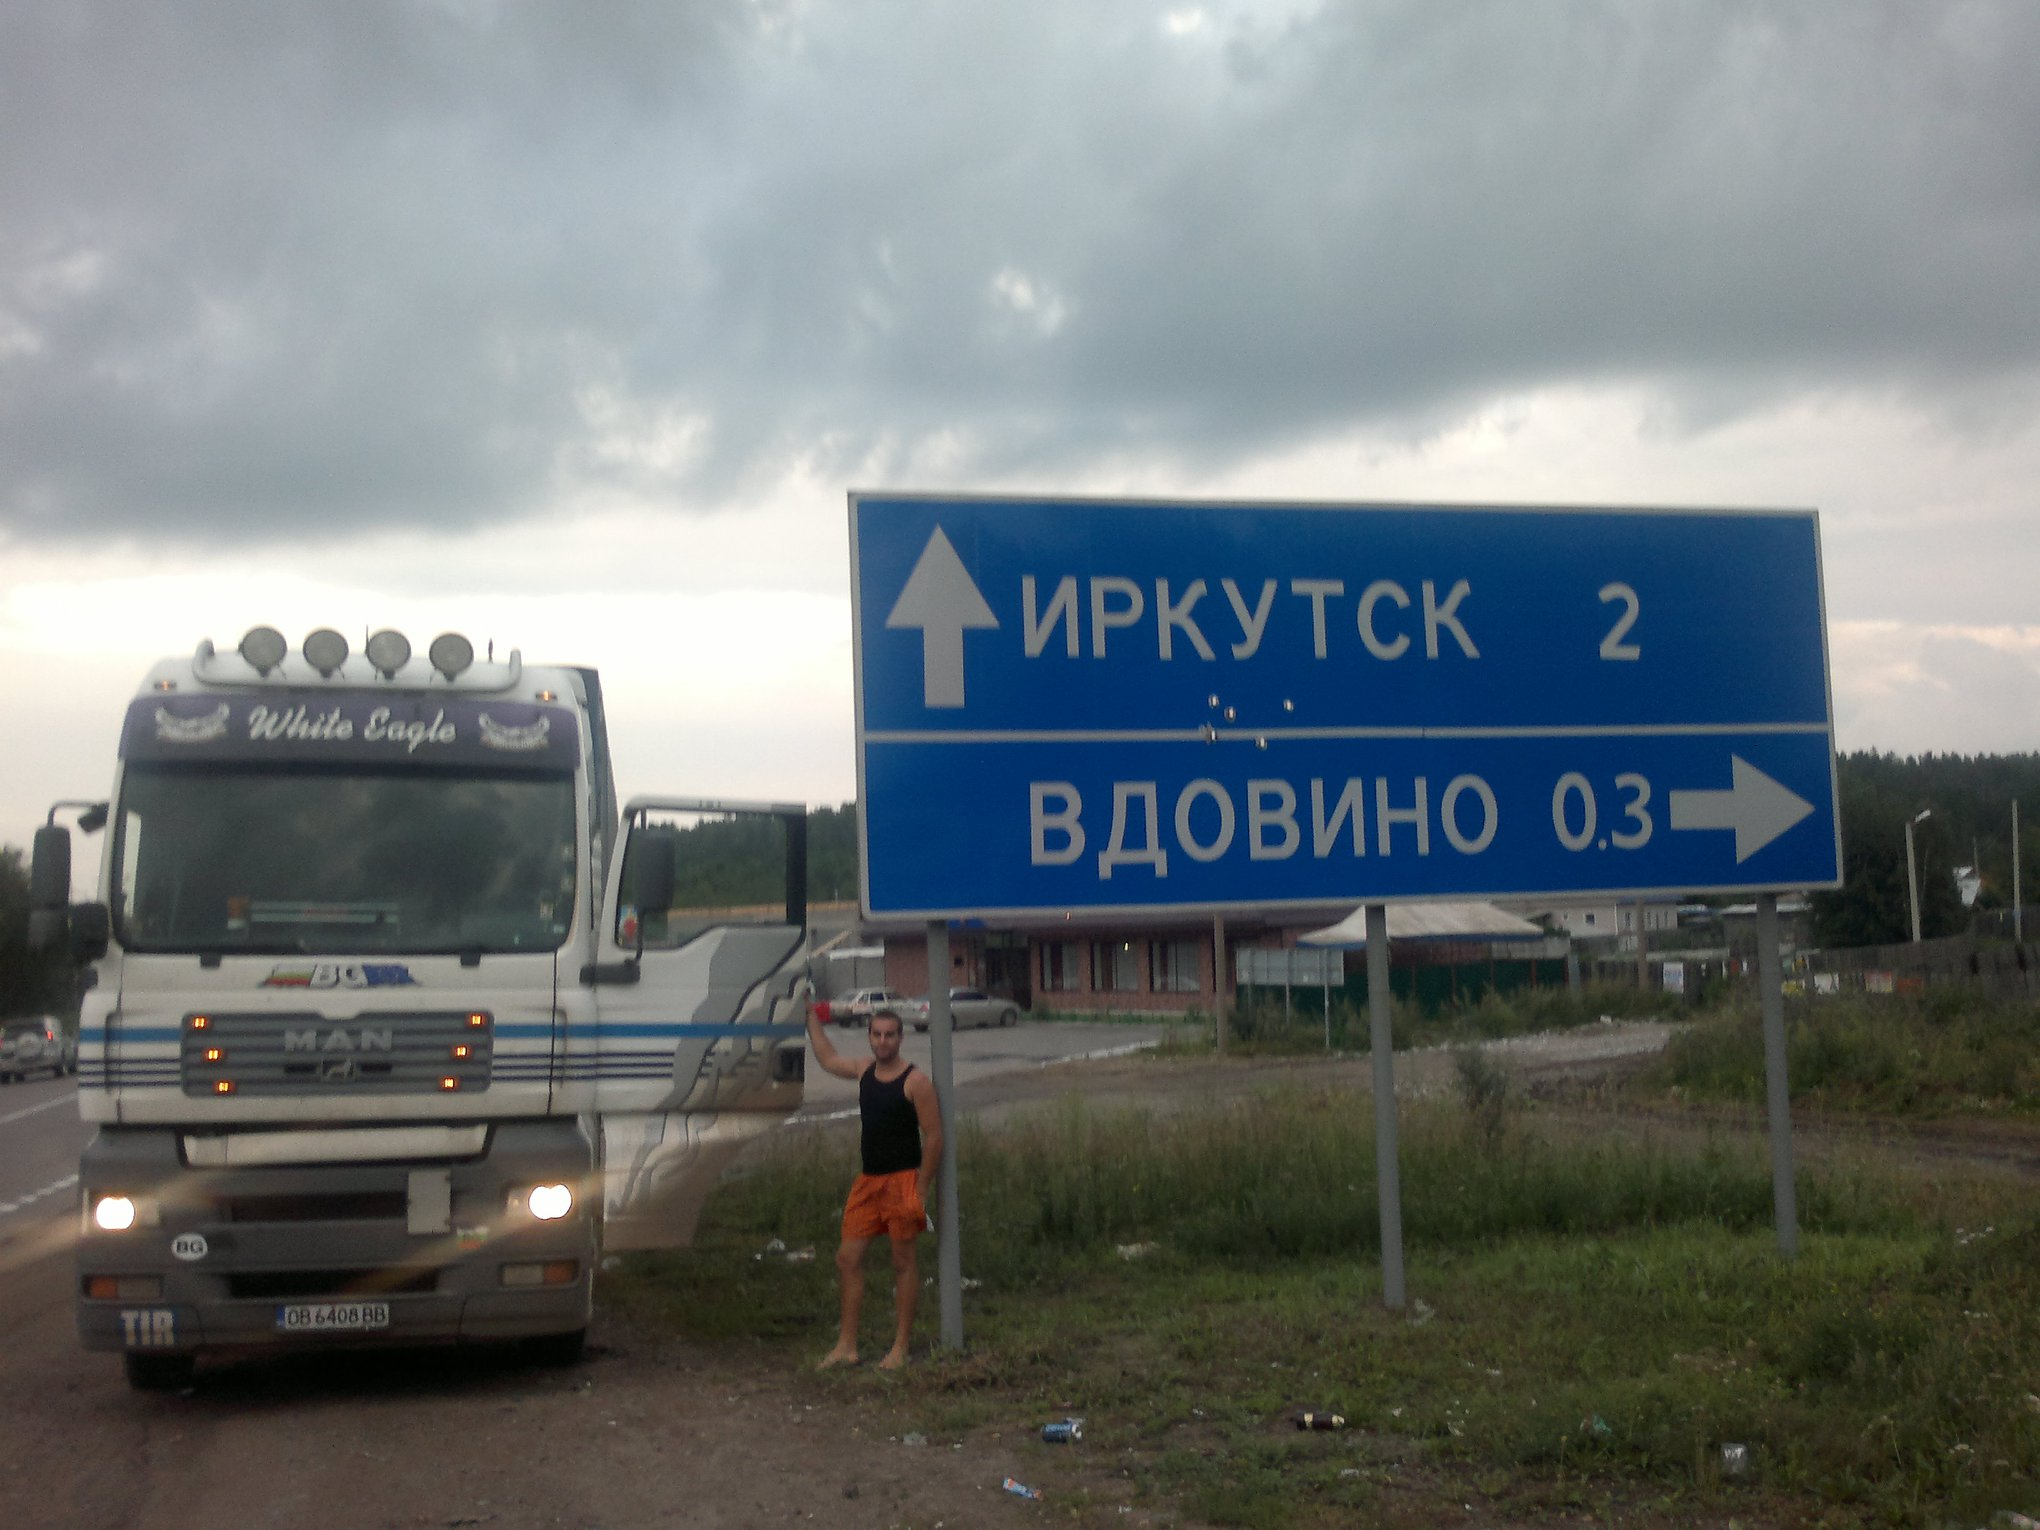 Hristo-Gruncharov-Lovec-Bulgaria-16